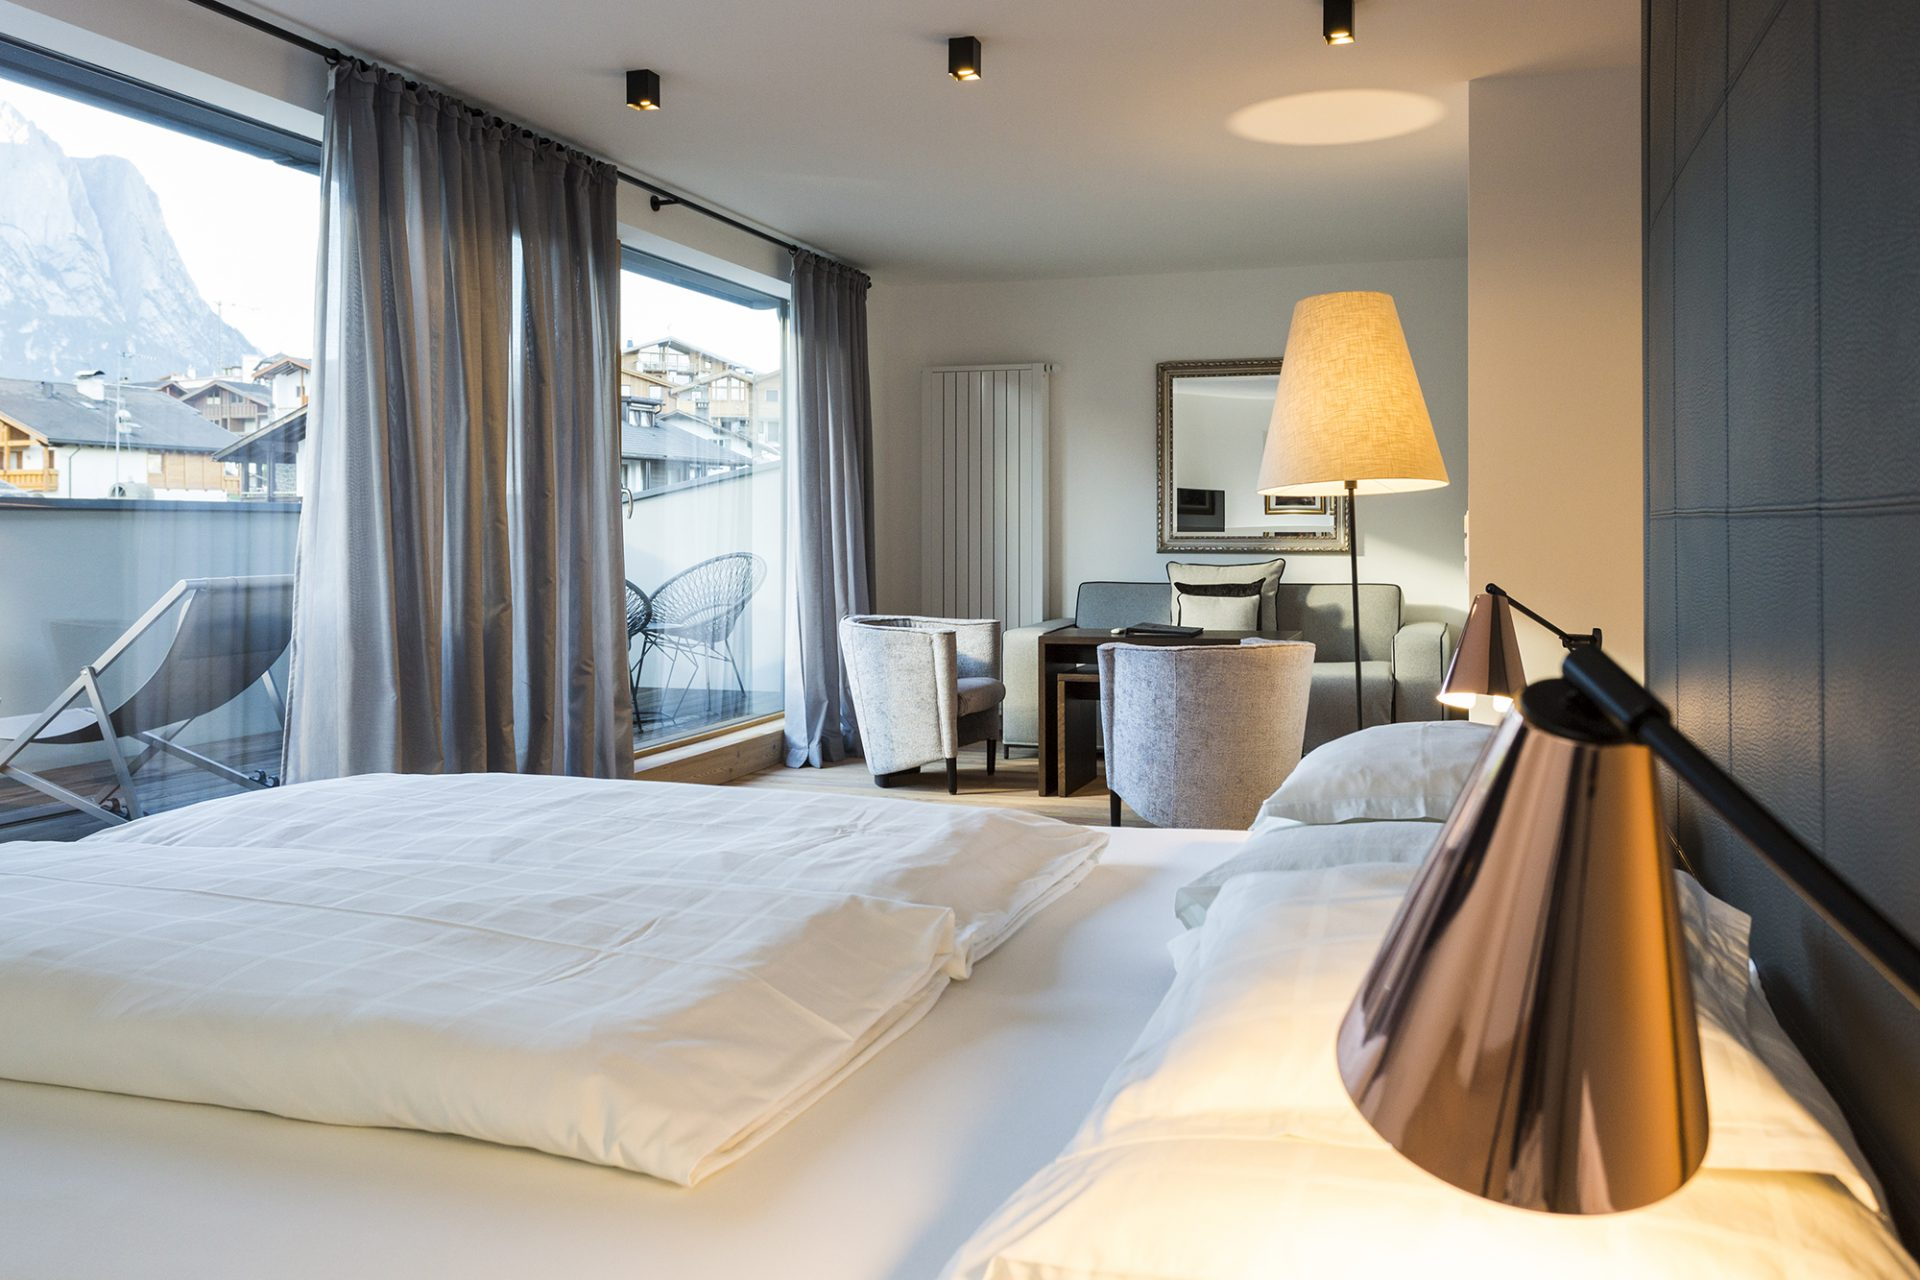 superior room-bed-desk lamp